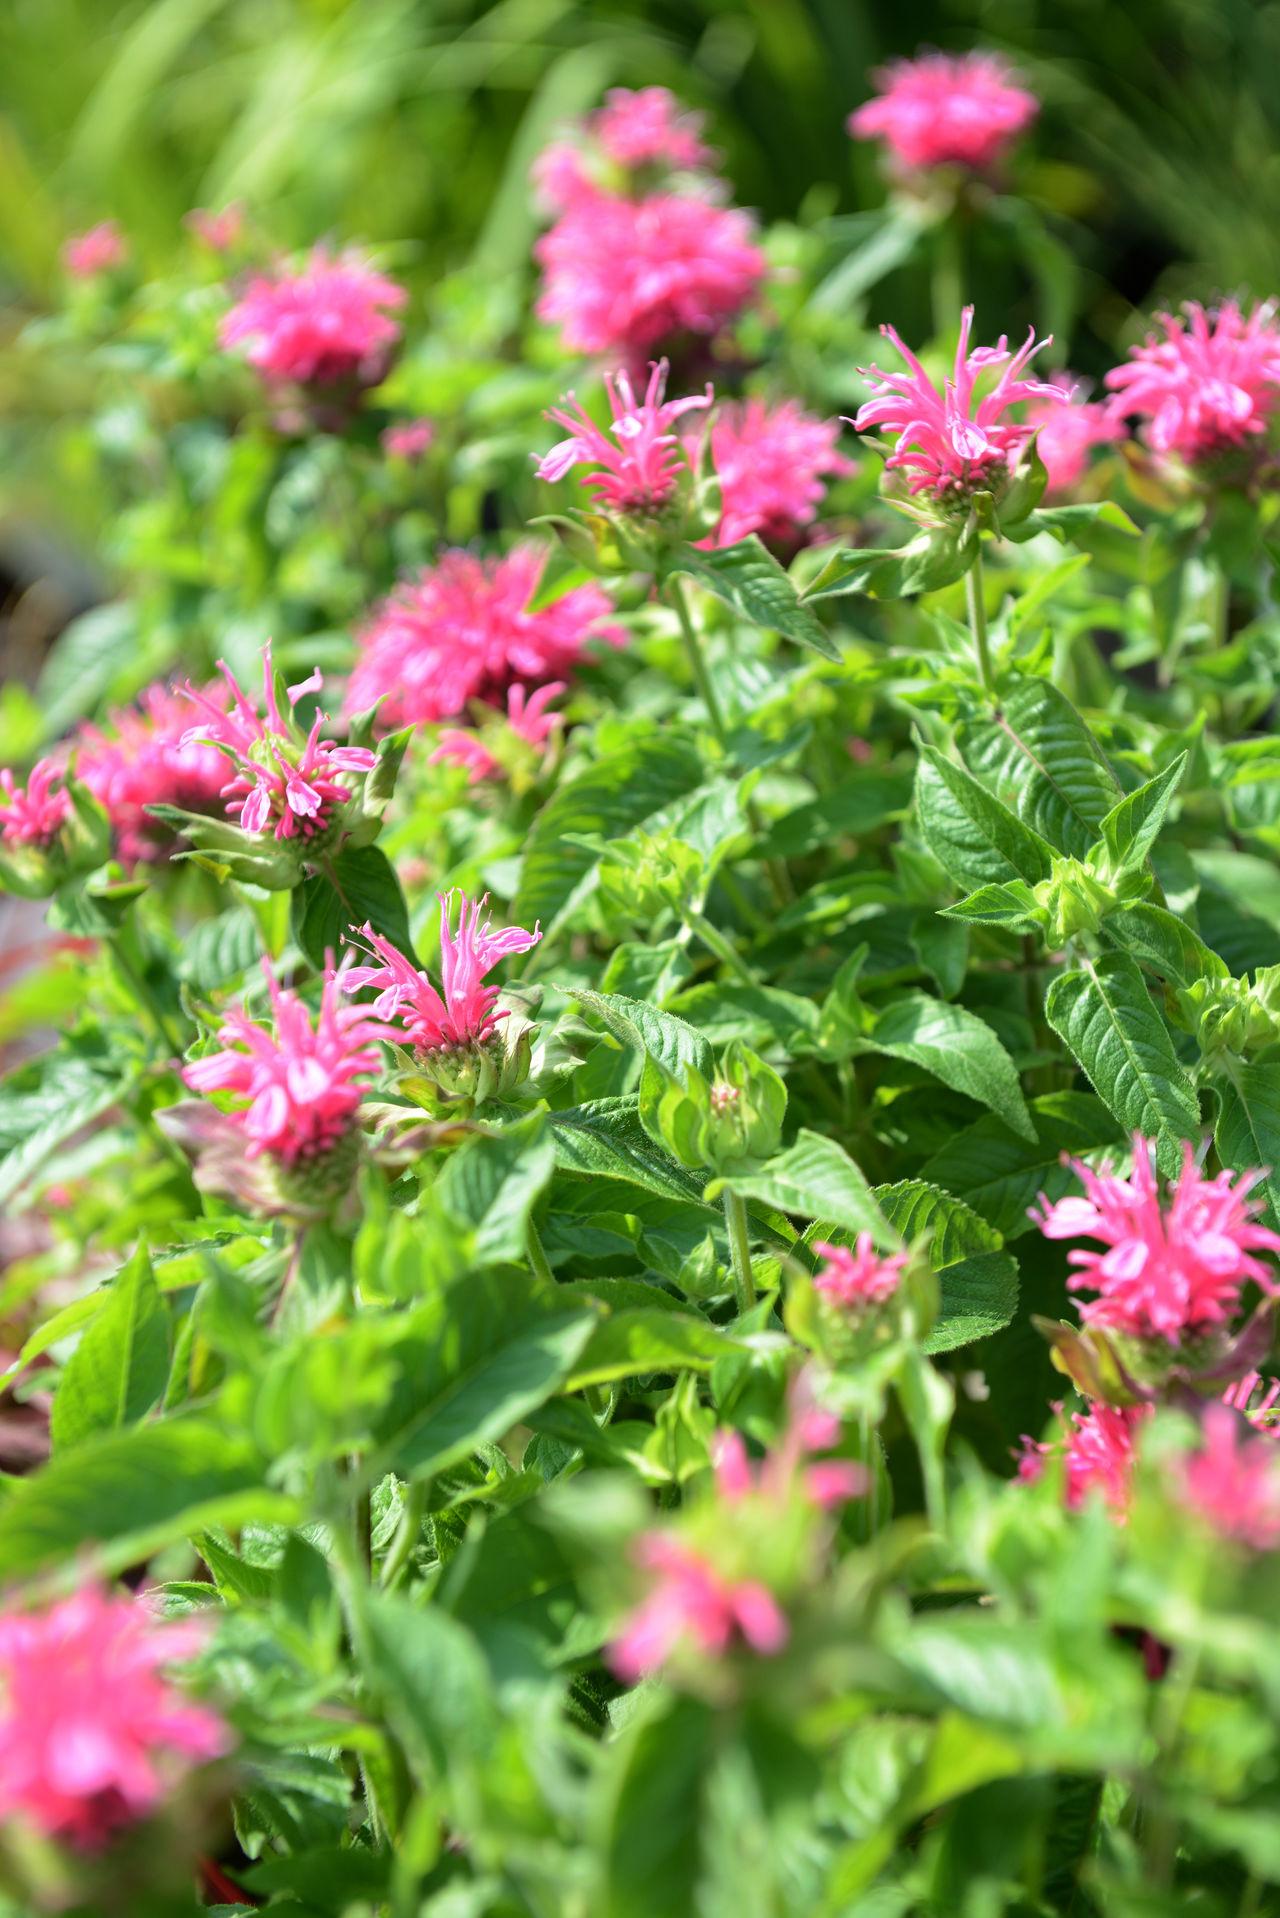 group of crimson beebalm (Monarda didyma) Blooming Botany Flower Pink Color Plant Crimson Beebalm Beebalm Monarda Didyma Monarda Full Frame Herbal Herbal Plant